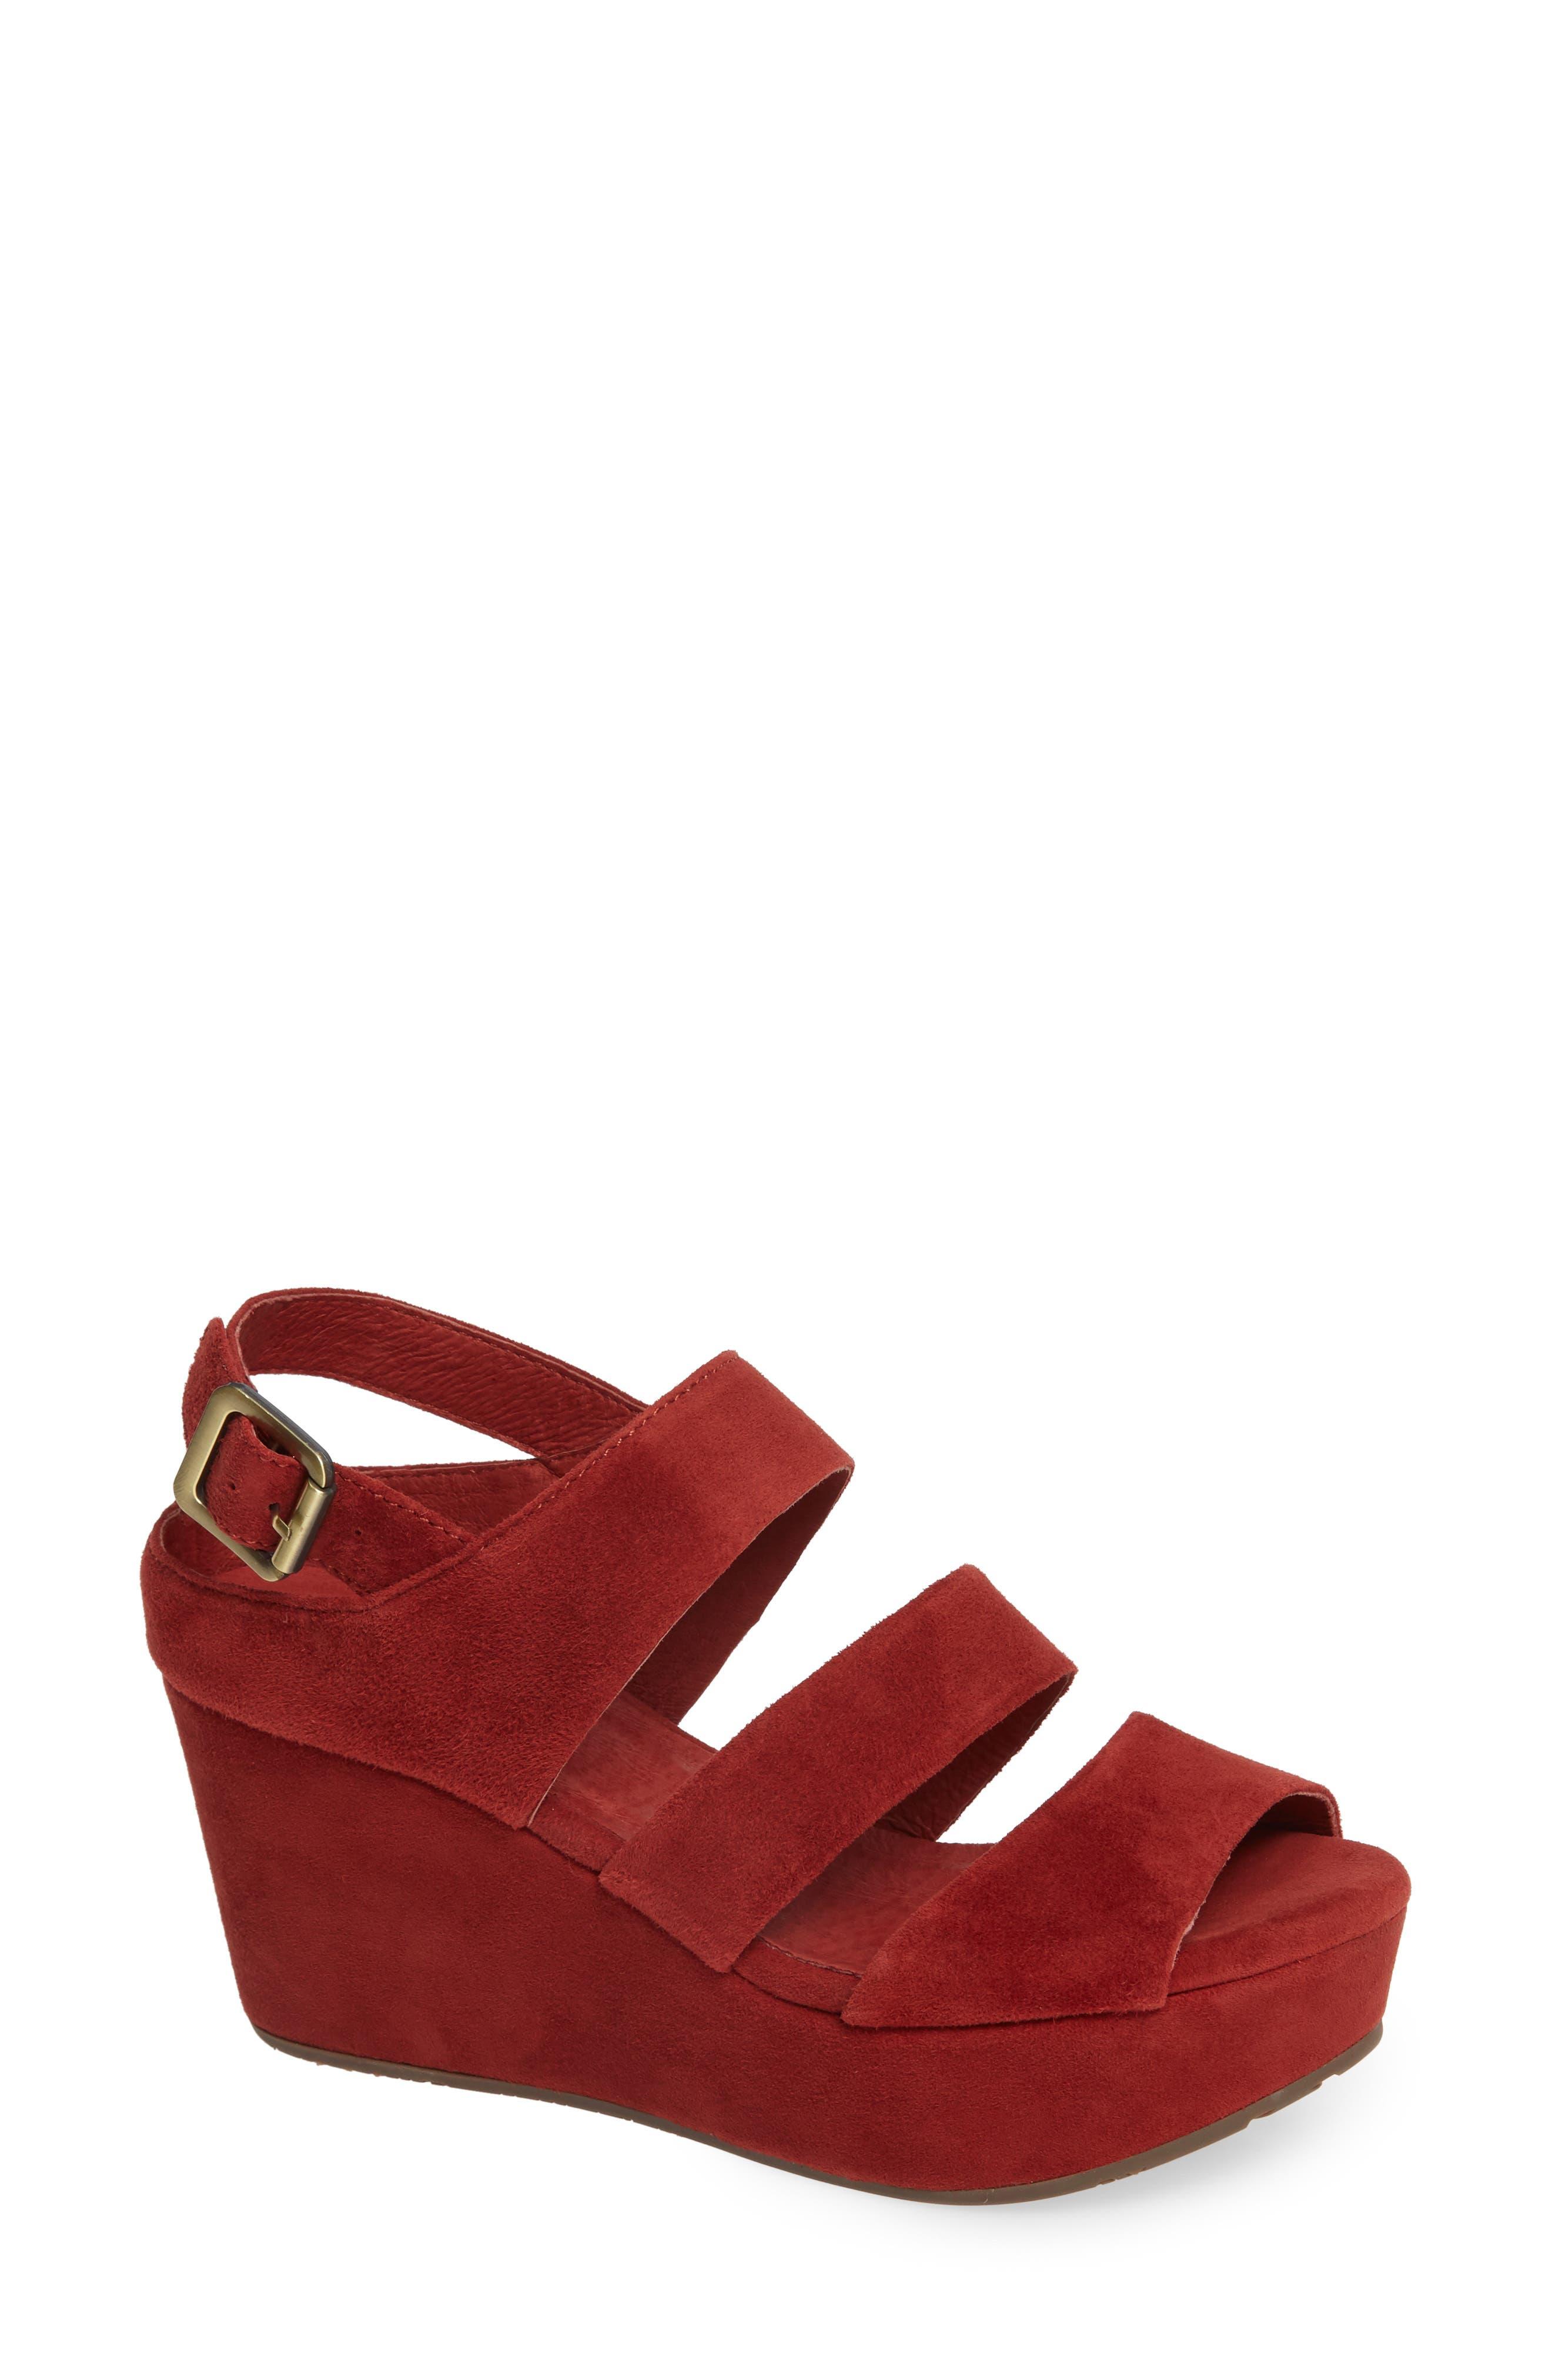 Chocolat Blu Winslet Slingback Sandal- Red